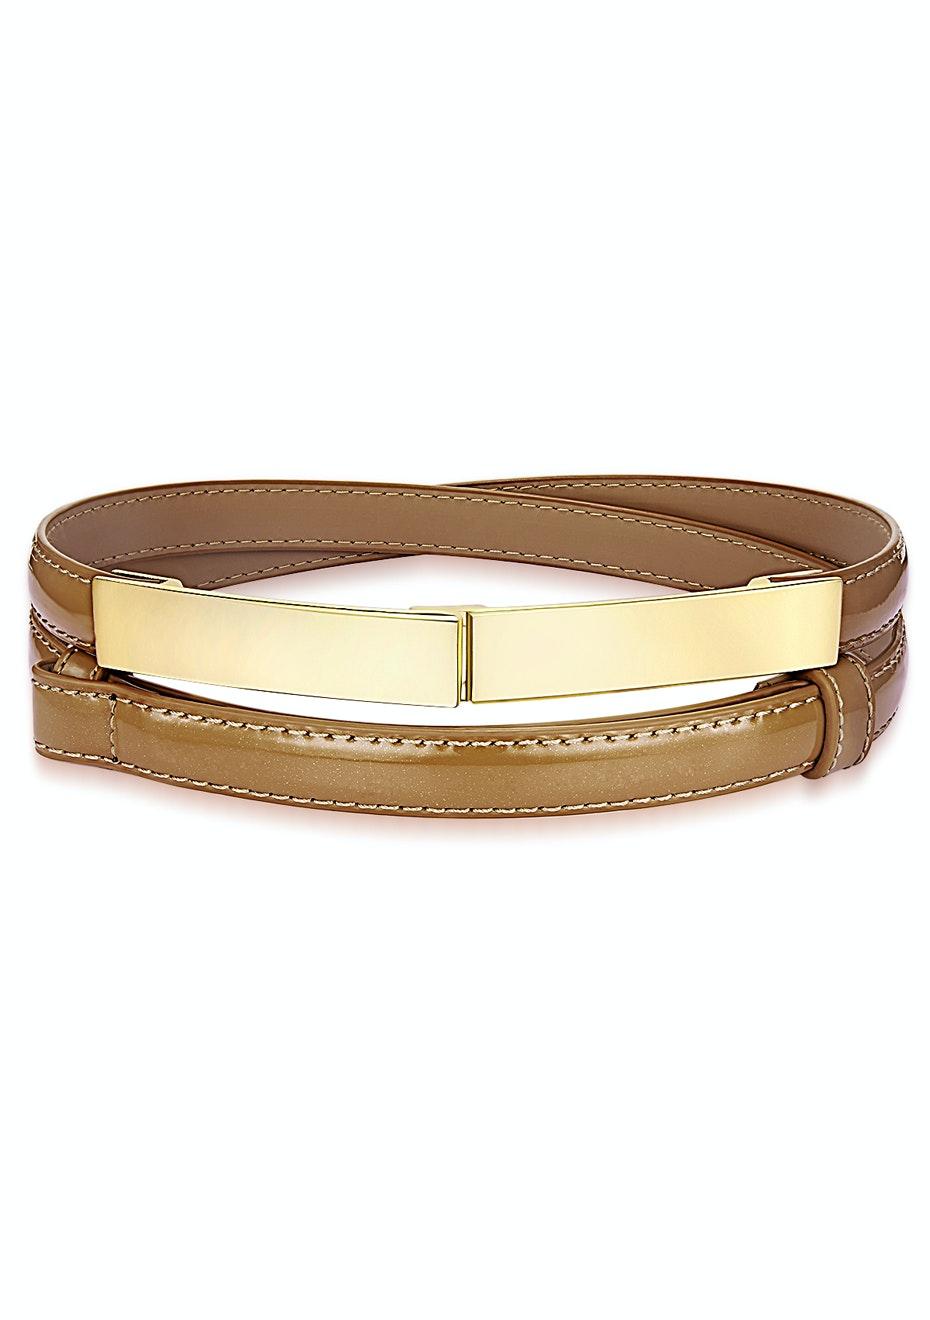 Genuine Cow Leather Skinny Waist Belt-Vogue brown